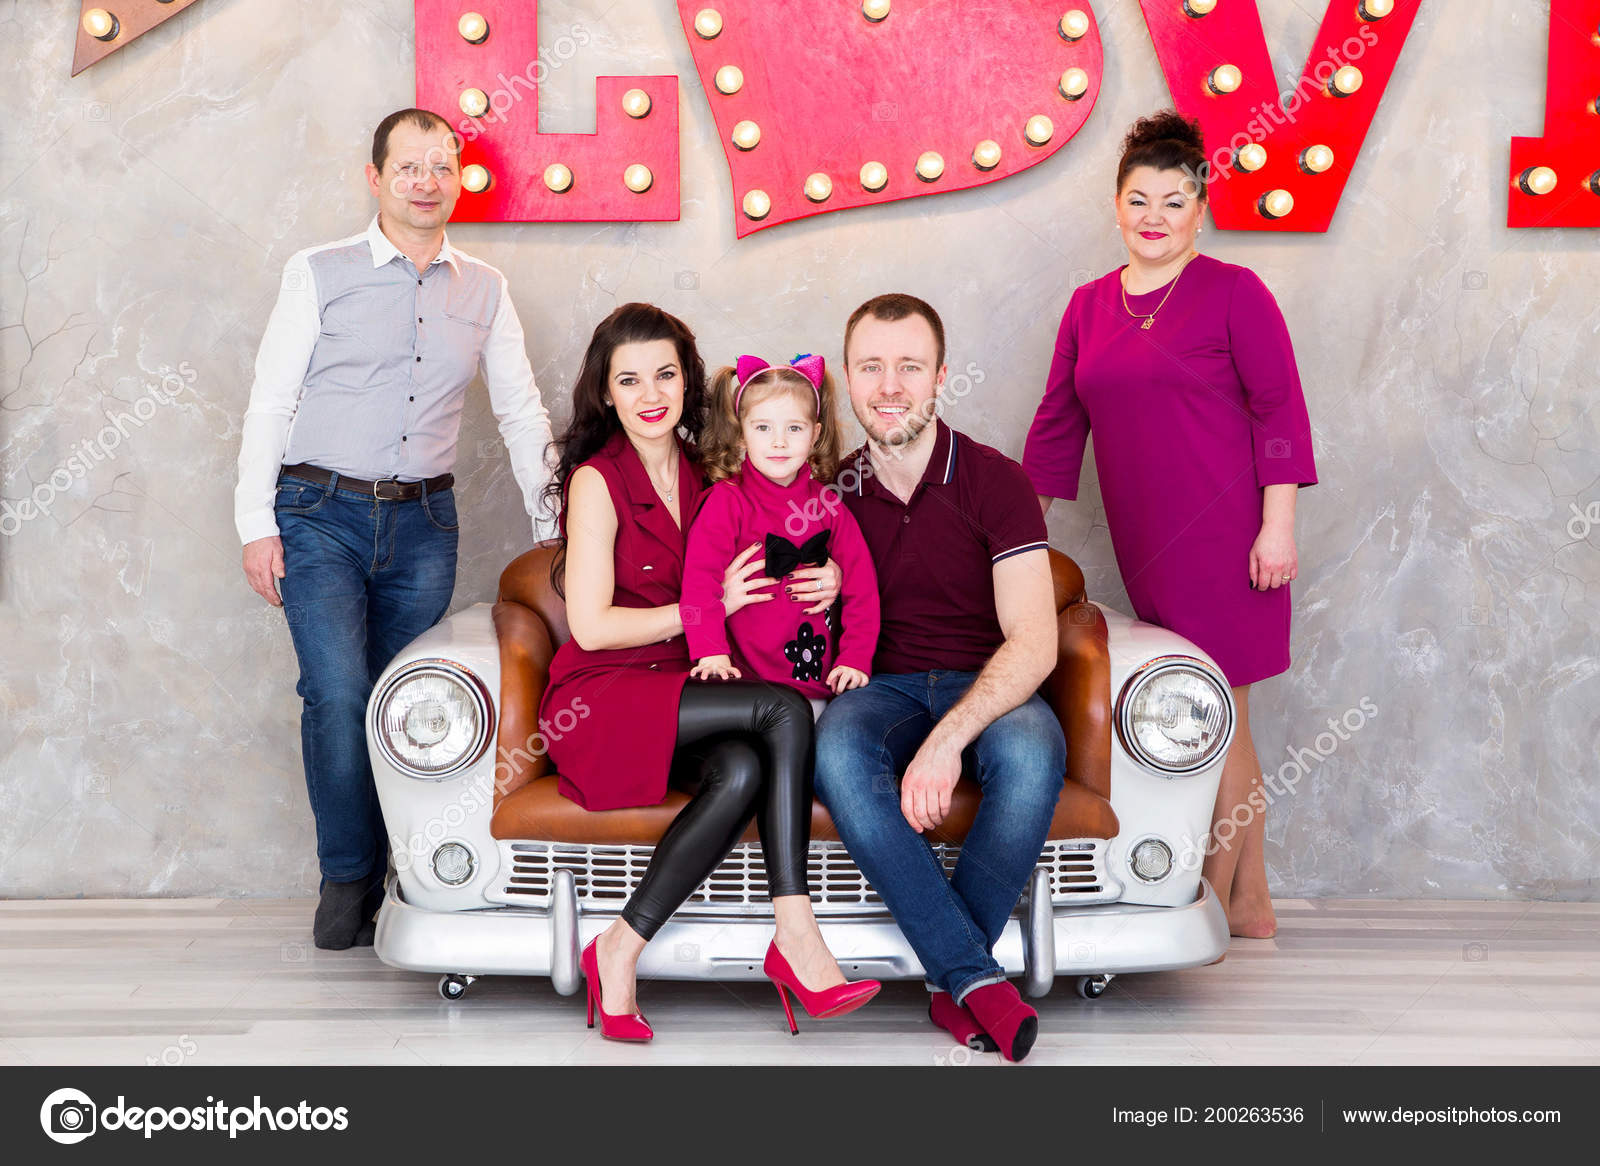 Photo Big Family Studio Background Scenery Stock Photo C Ribalka